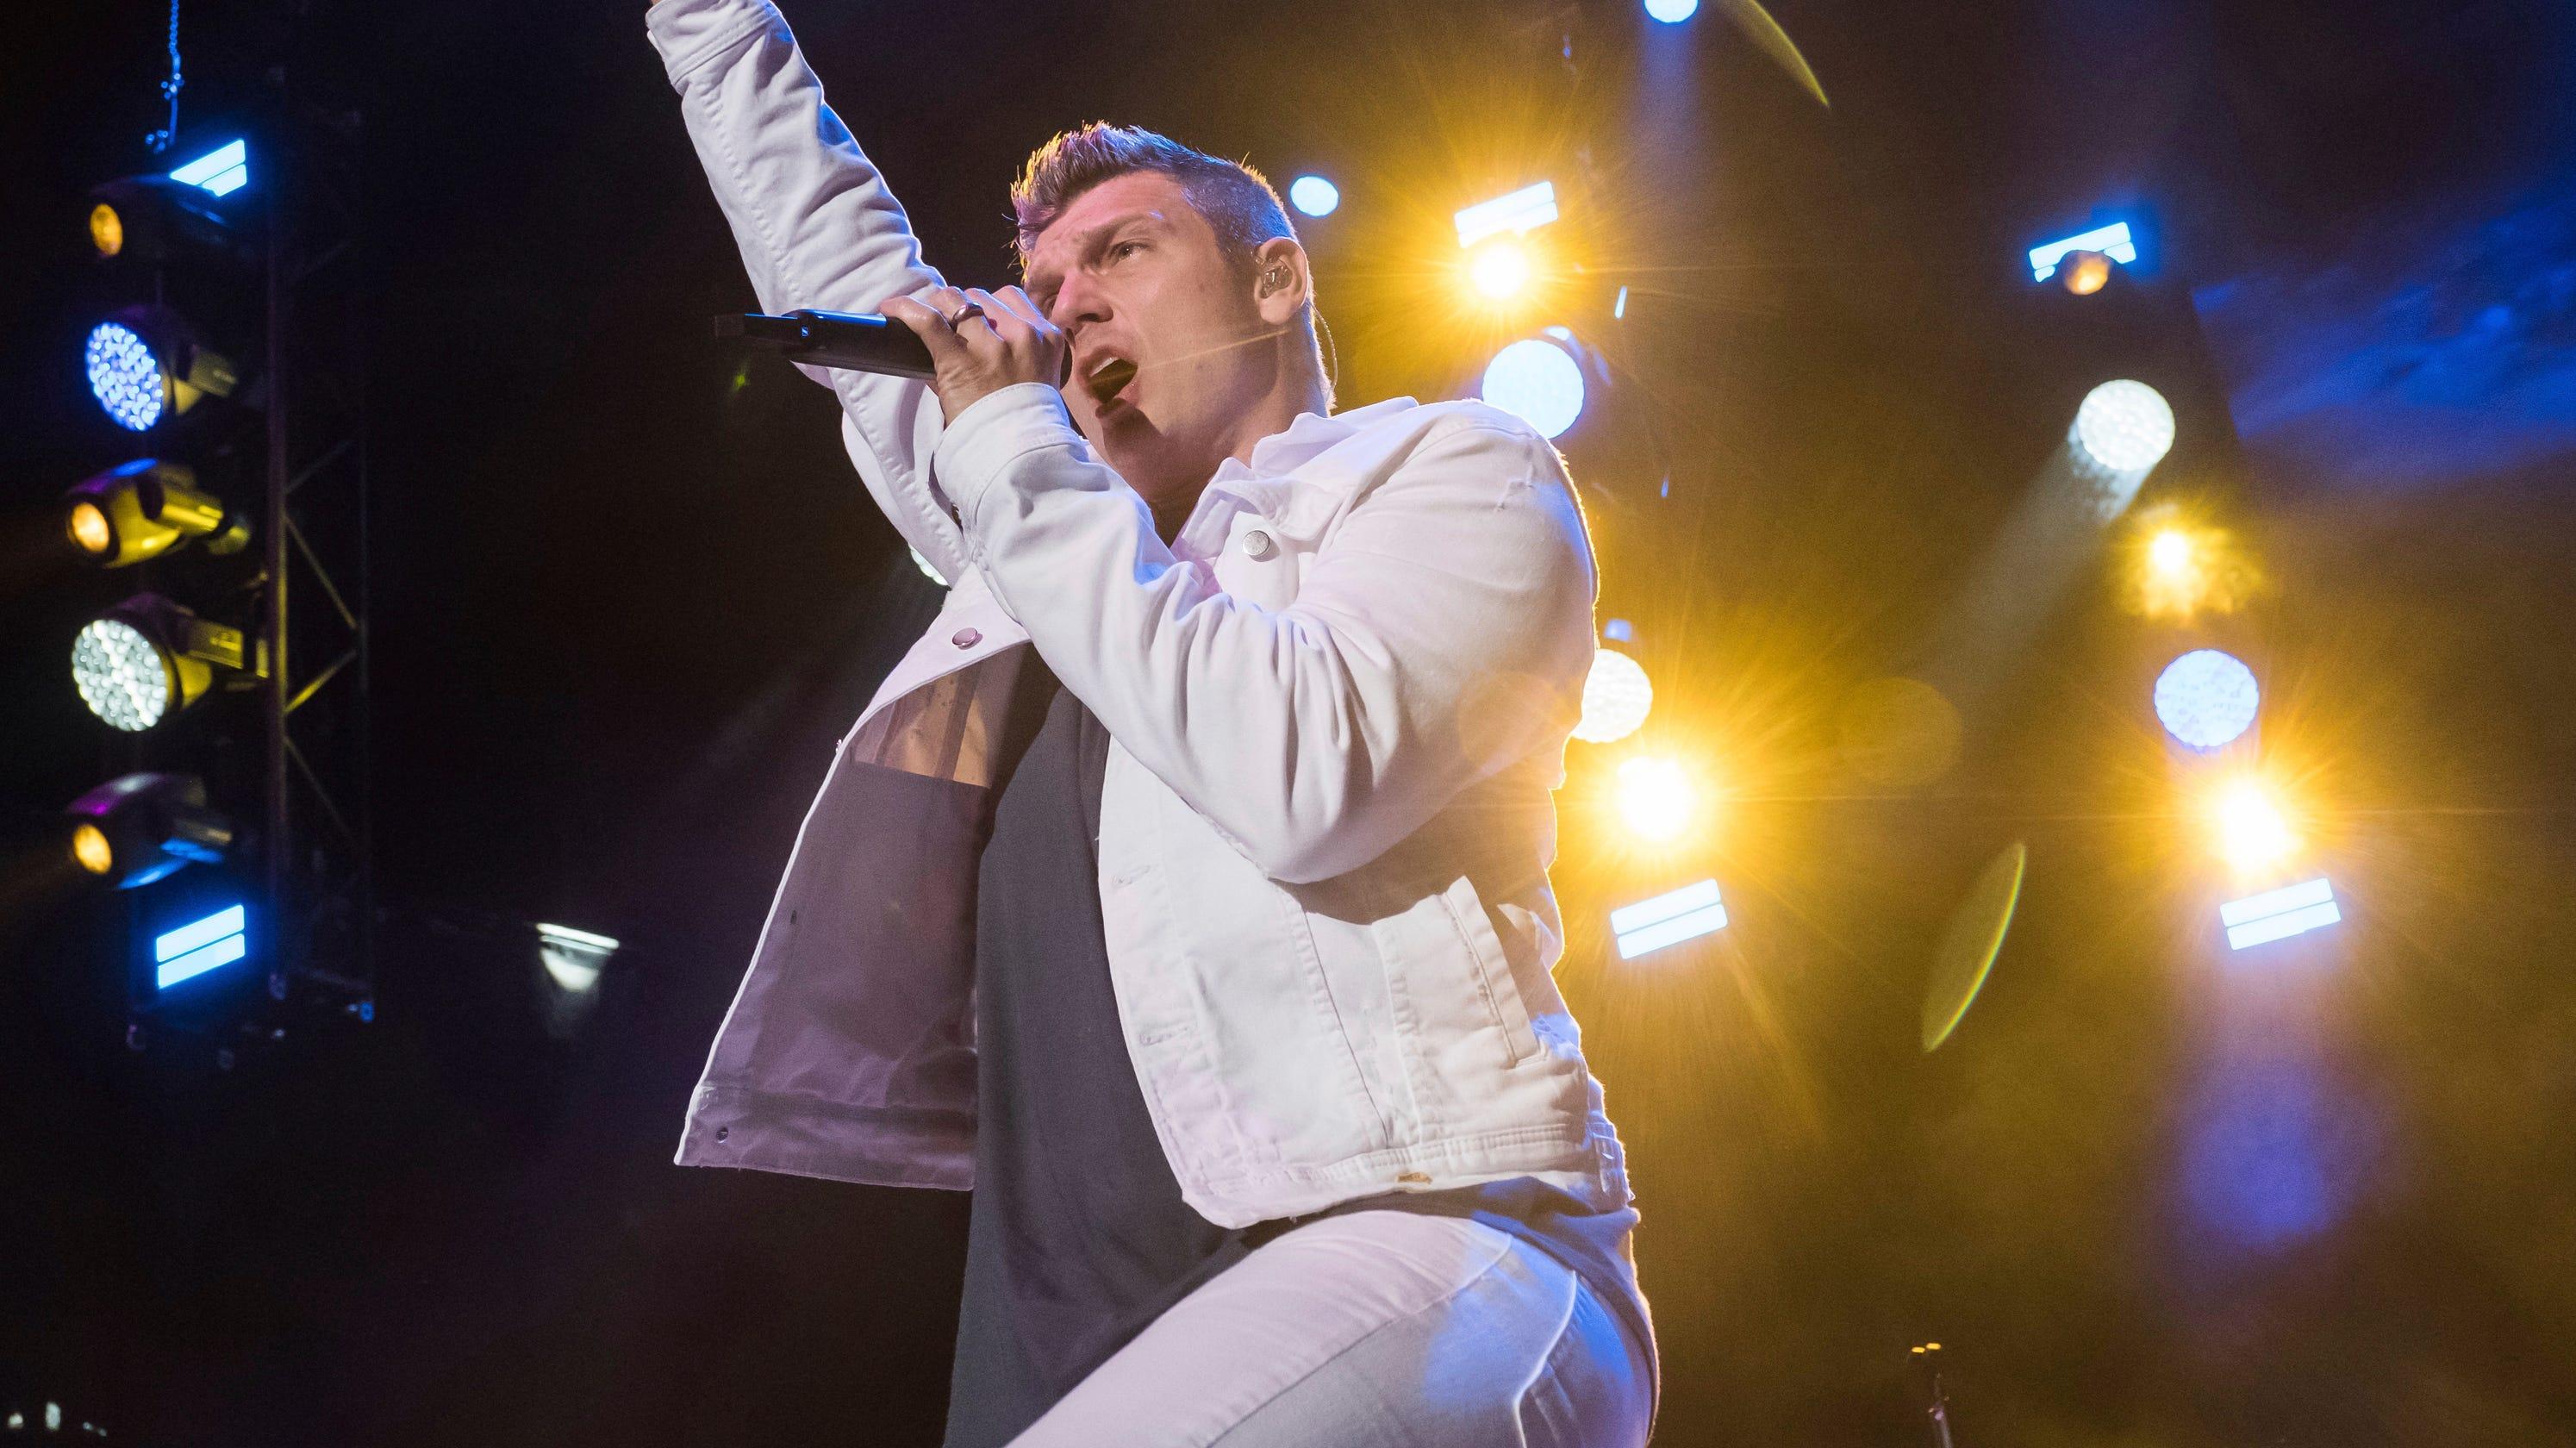 Backstreet Boy Nick Carter won't be charged with 2003 rape